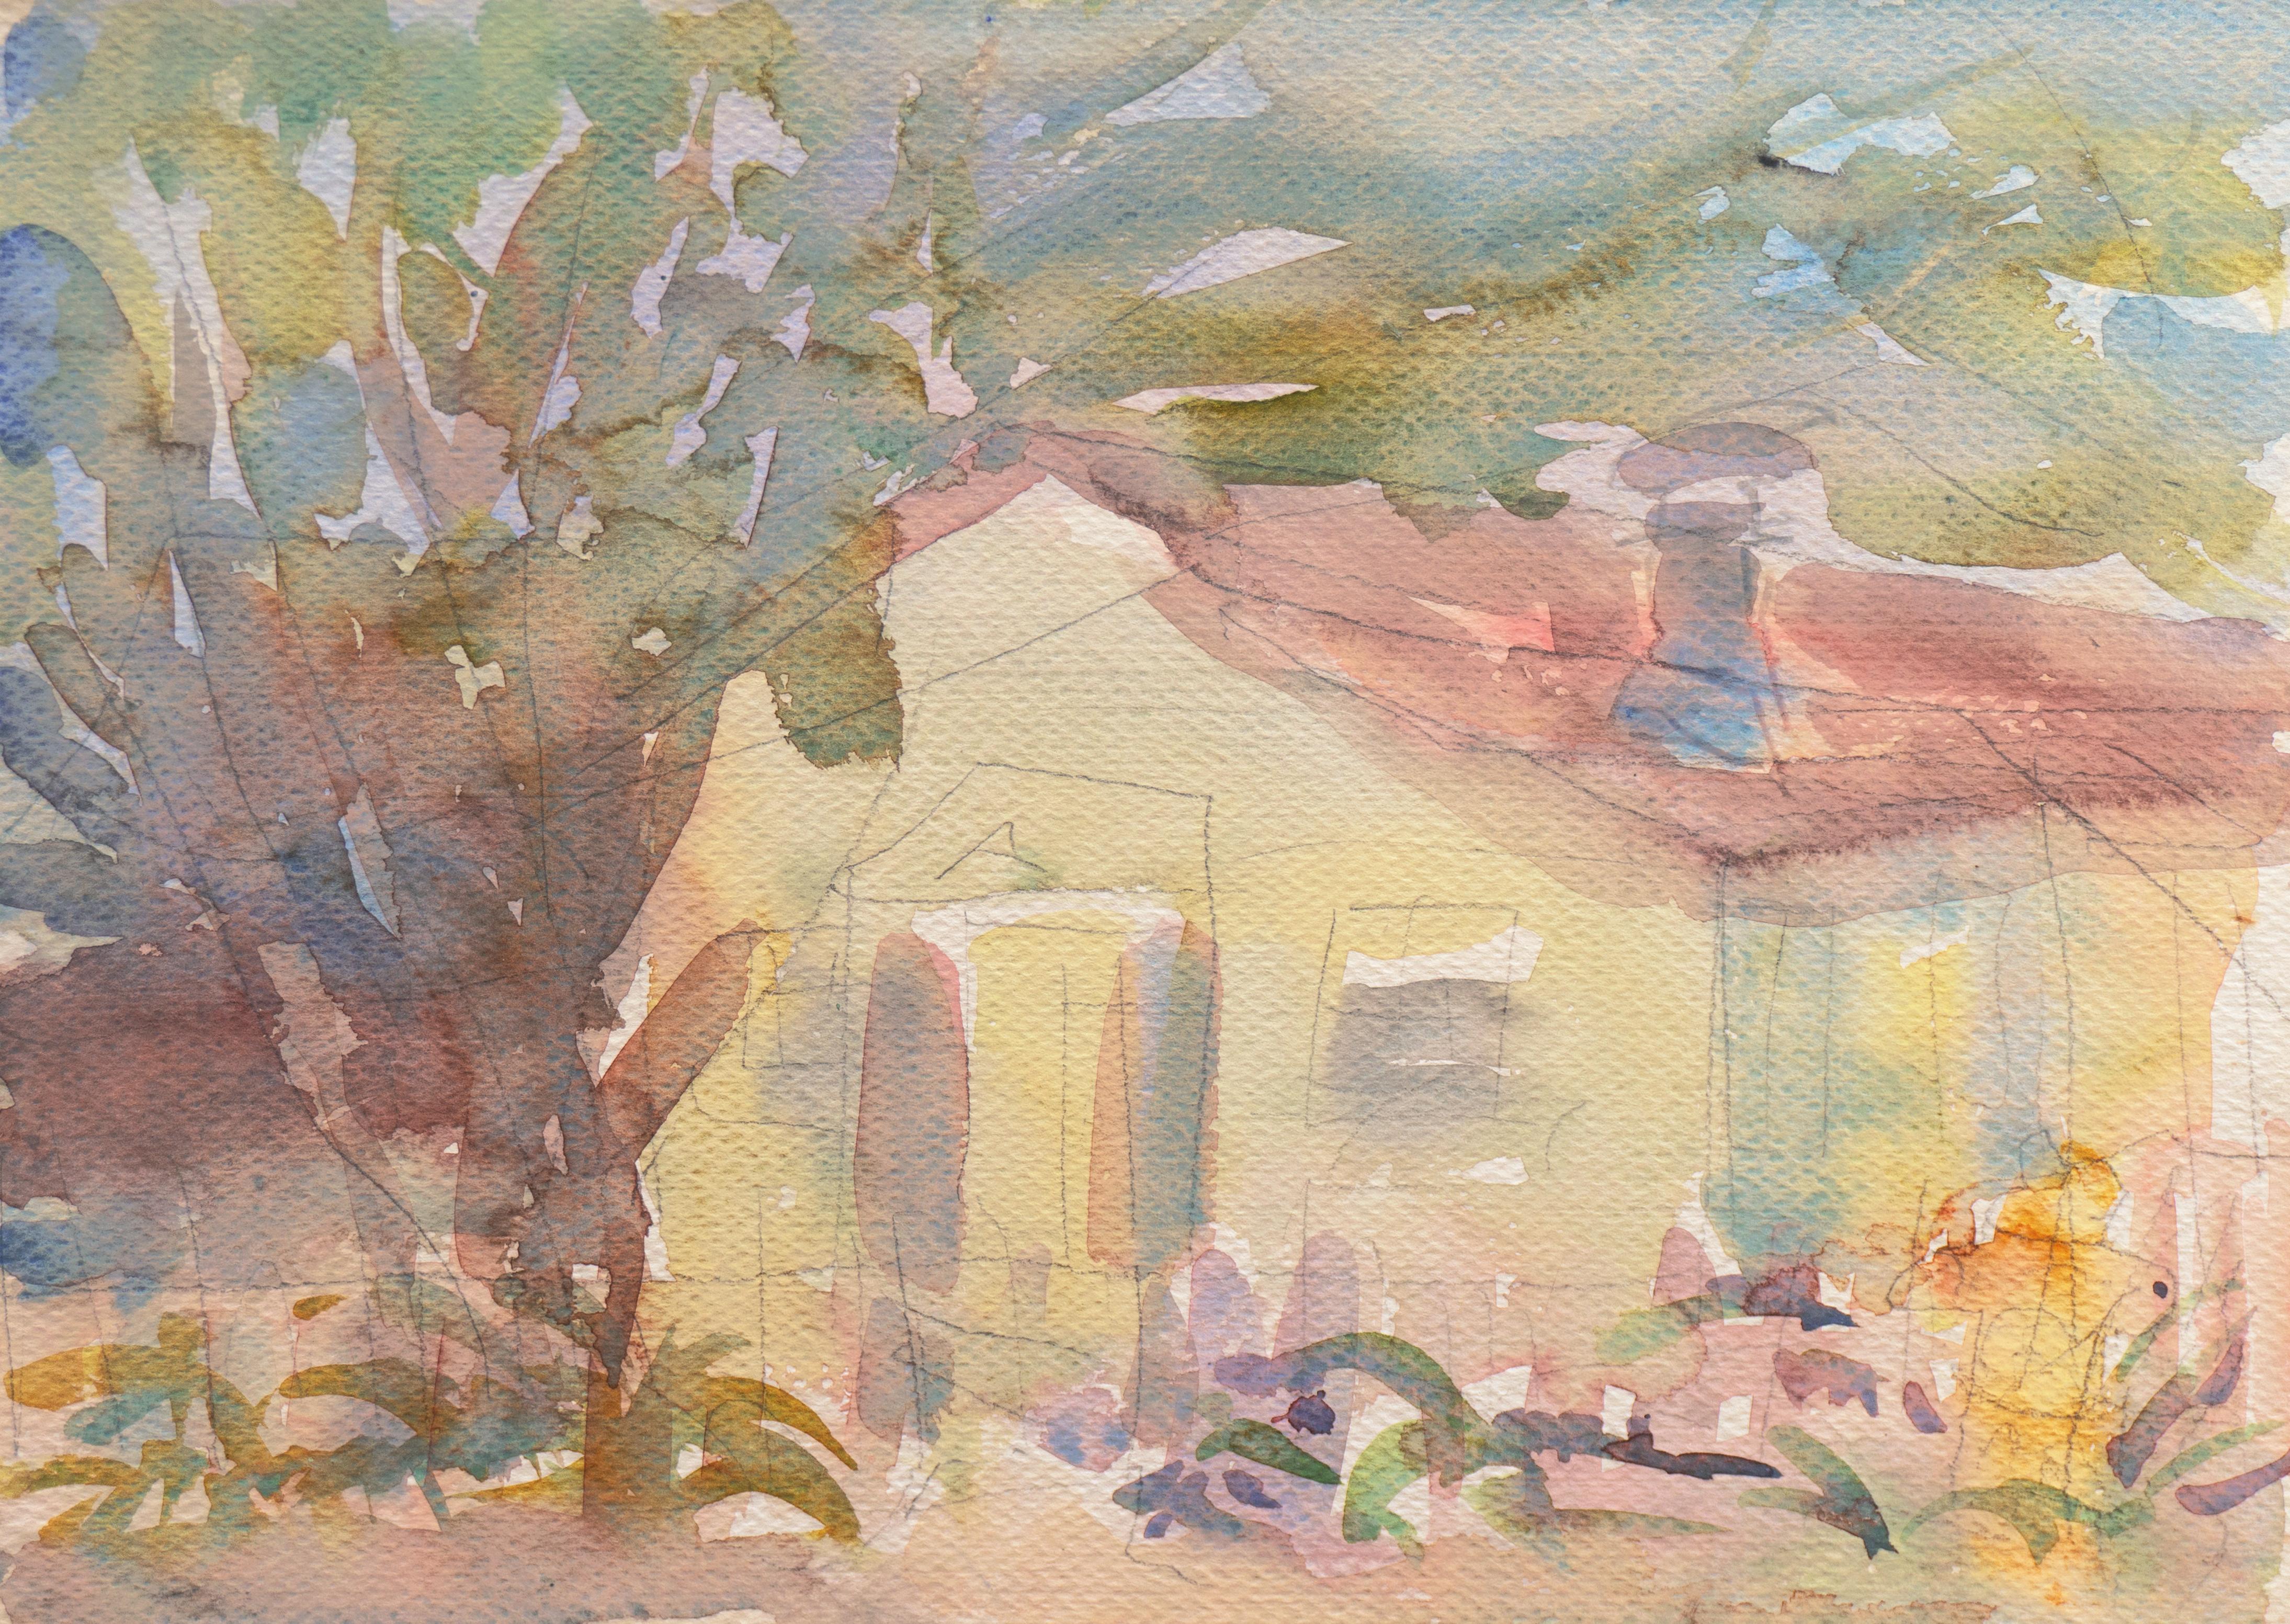 'Old Carmel Cottage', California, Louvre, Academie Chaumiere, Paris, SFAA, LACMA